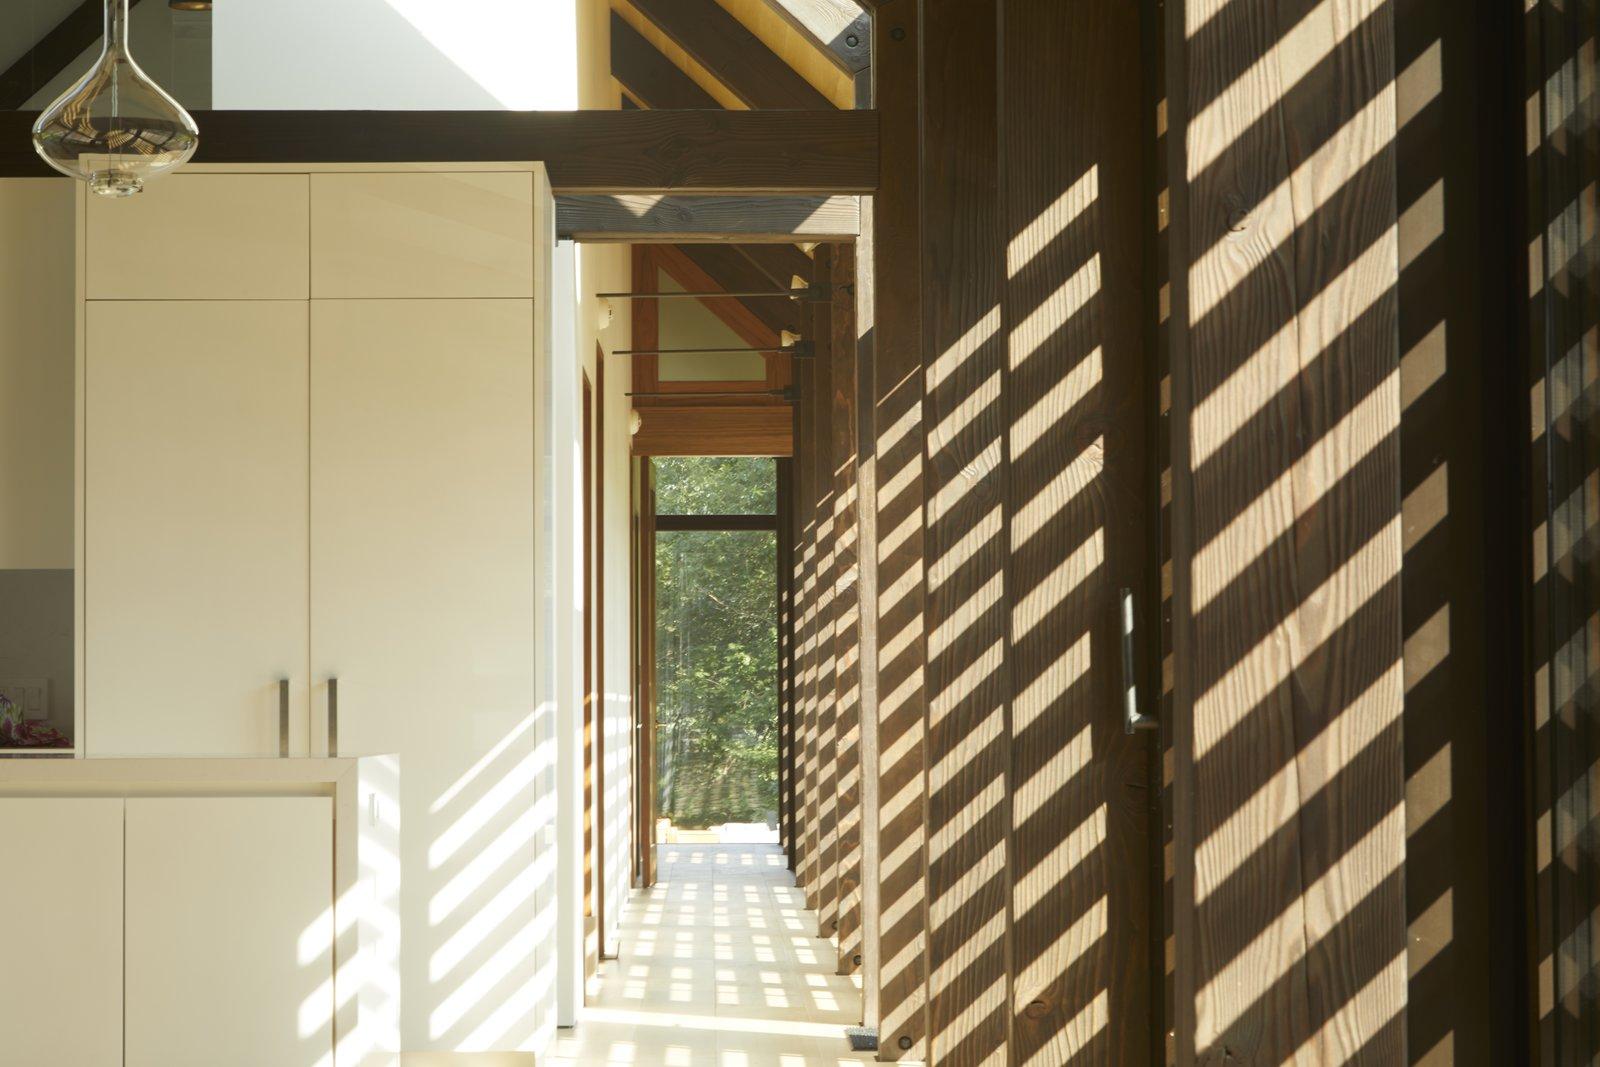 Silvernails hallway